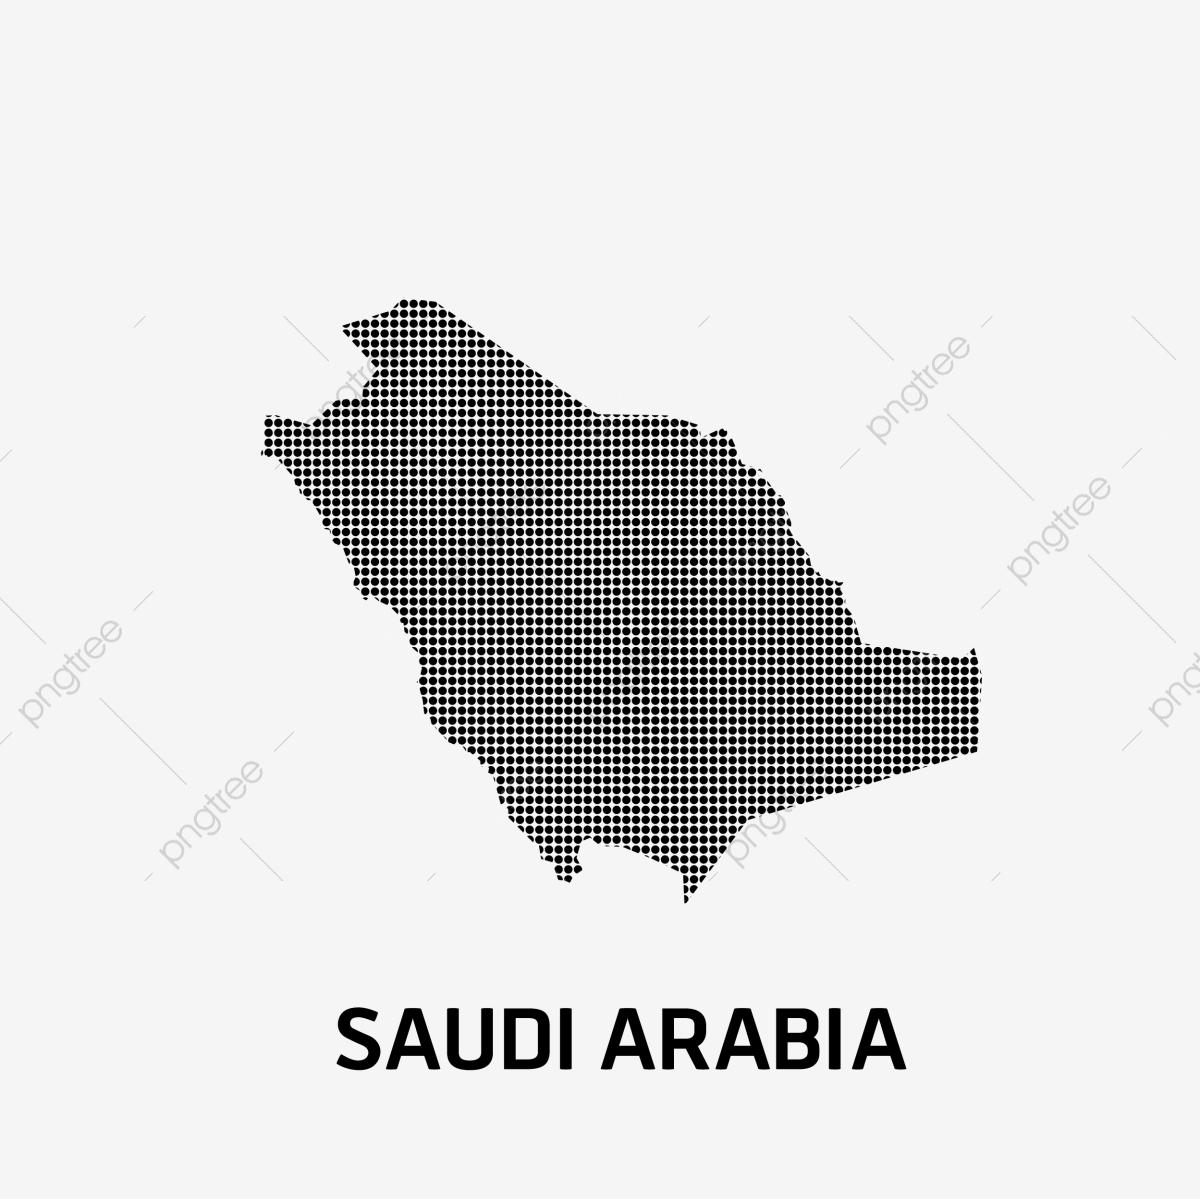 Saudi Arabia Map Icon Saudi National Day Saudi Arabia ... on syria world map, india world map, ukraine world map, iraq world map, vietnam world map, yemen world map, nigeria world map, ireland world map, macedonia world map, israel world map, cambodia world map, belgium world map, china world map, venezuela world map, egypt world map, netherlands world map, afghanistan world map, iran world map, congo world map, turkey world map,